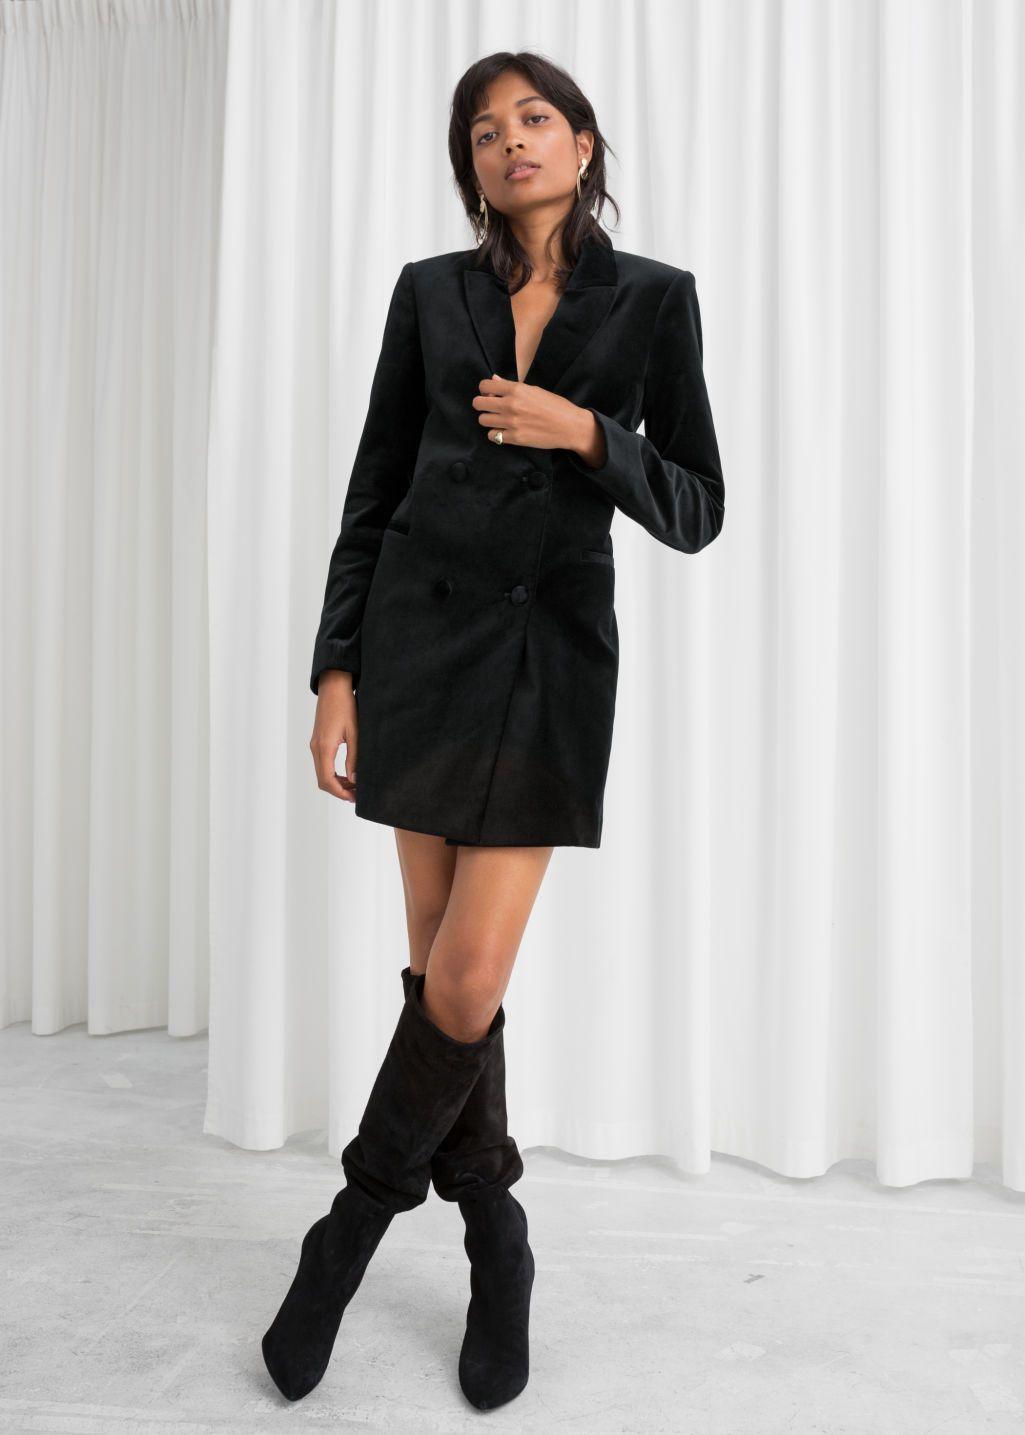 Velvet Blazer Dress Blazer Dress Velvet Blazer High Fashion Street Style [ 1435 x 1025 Pixel ]